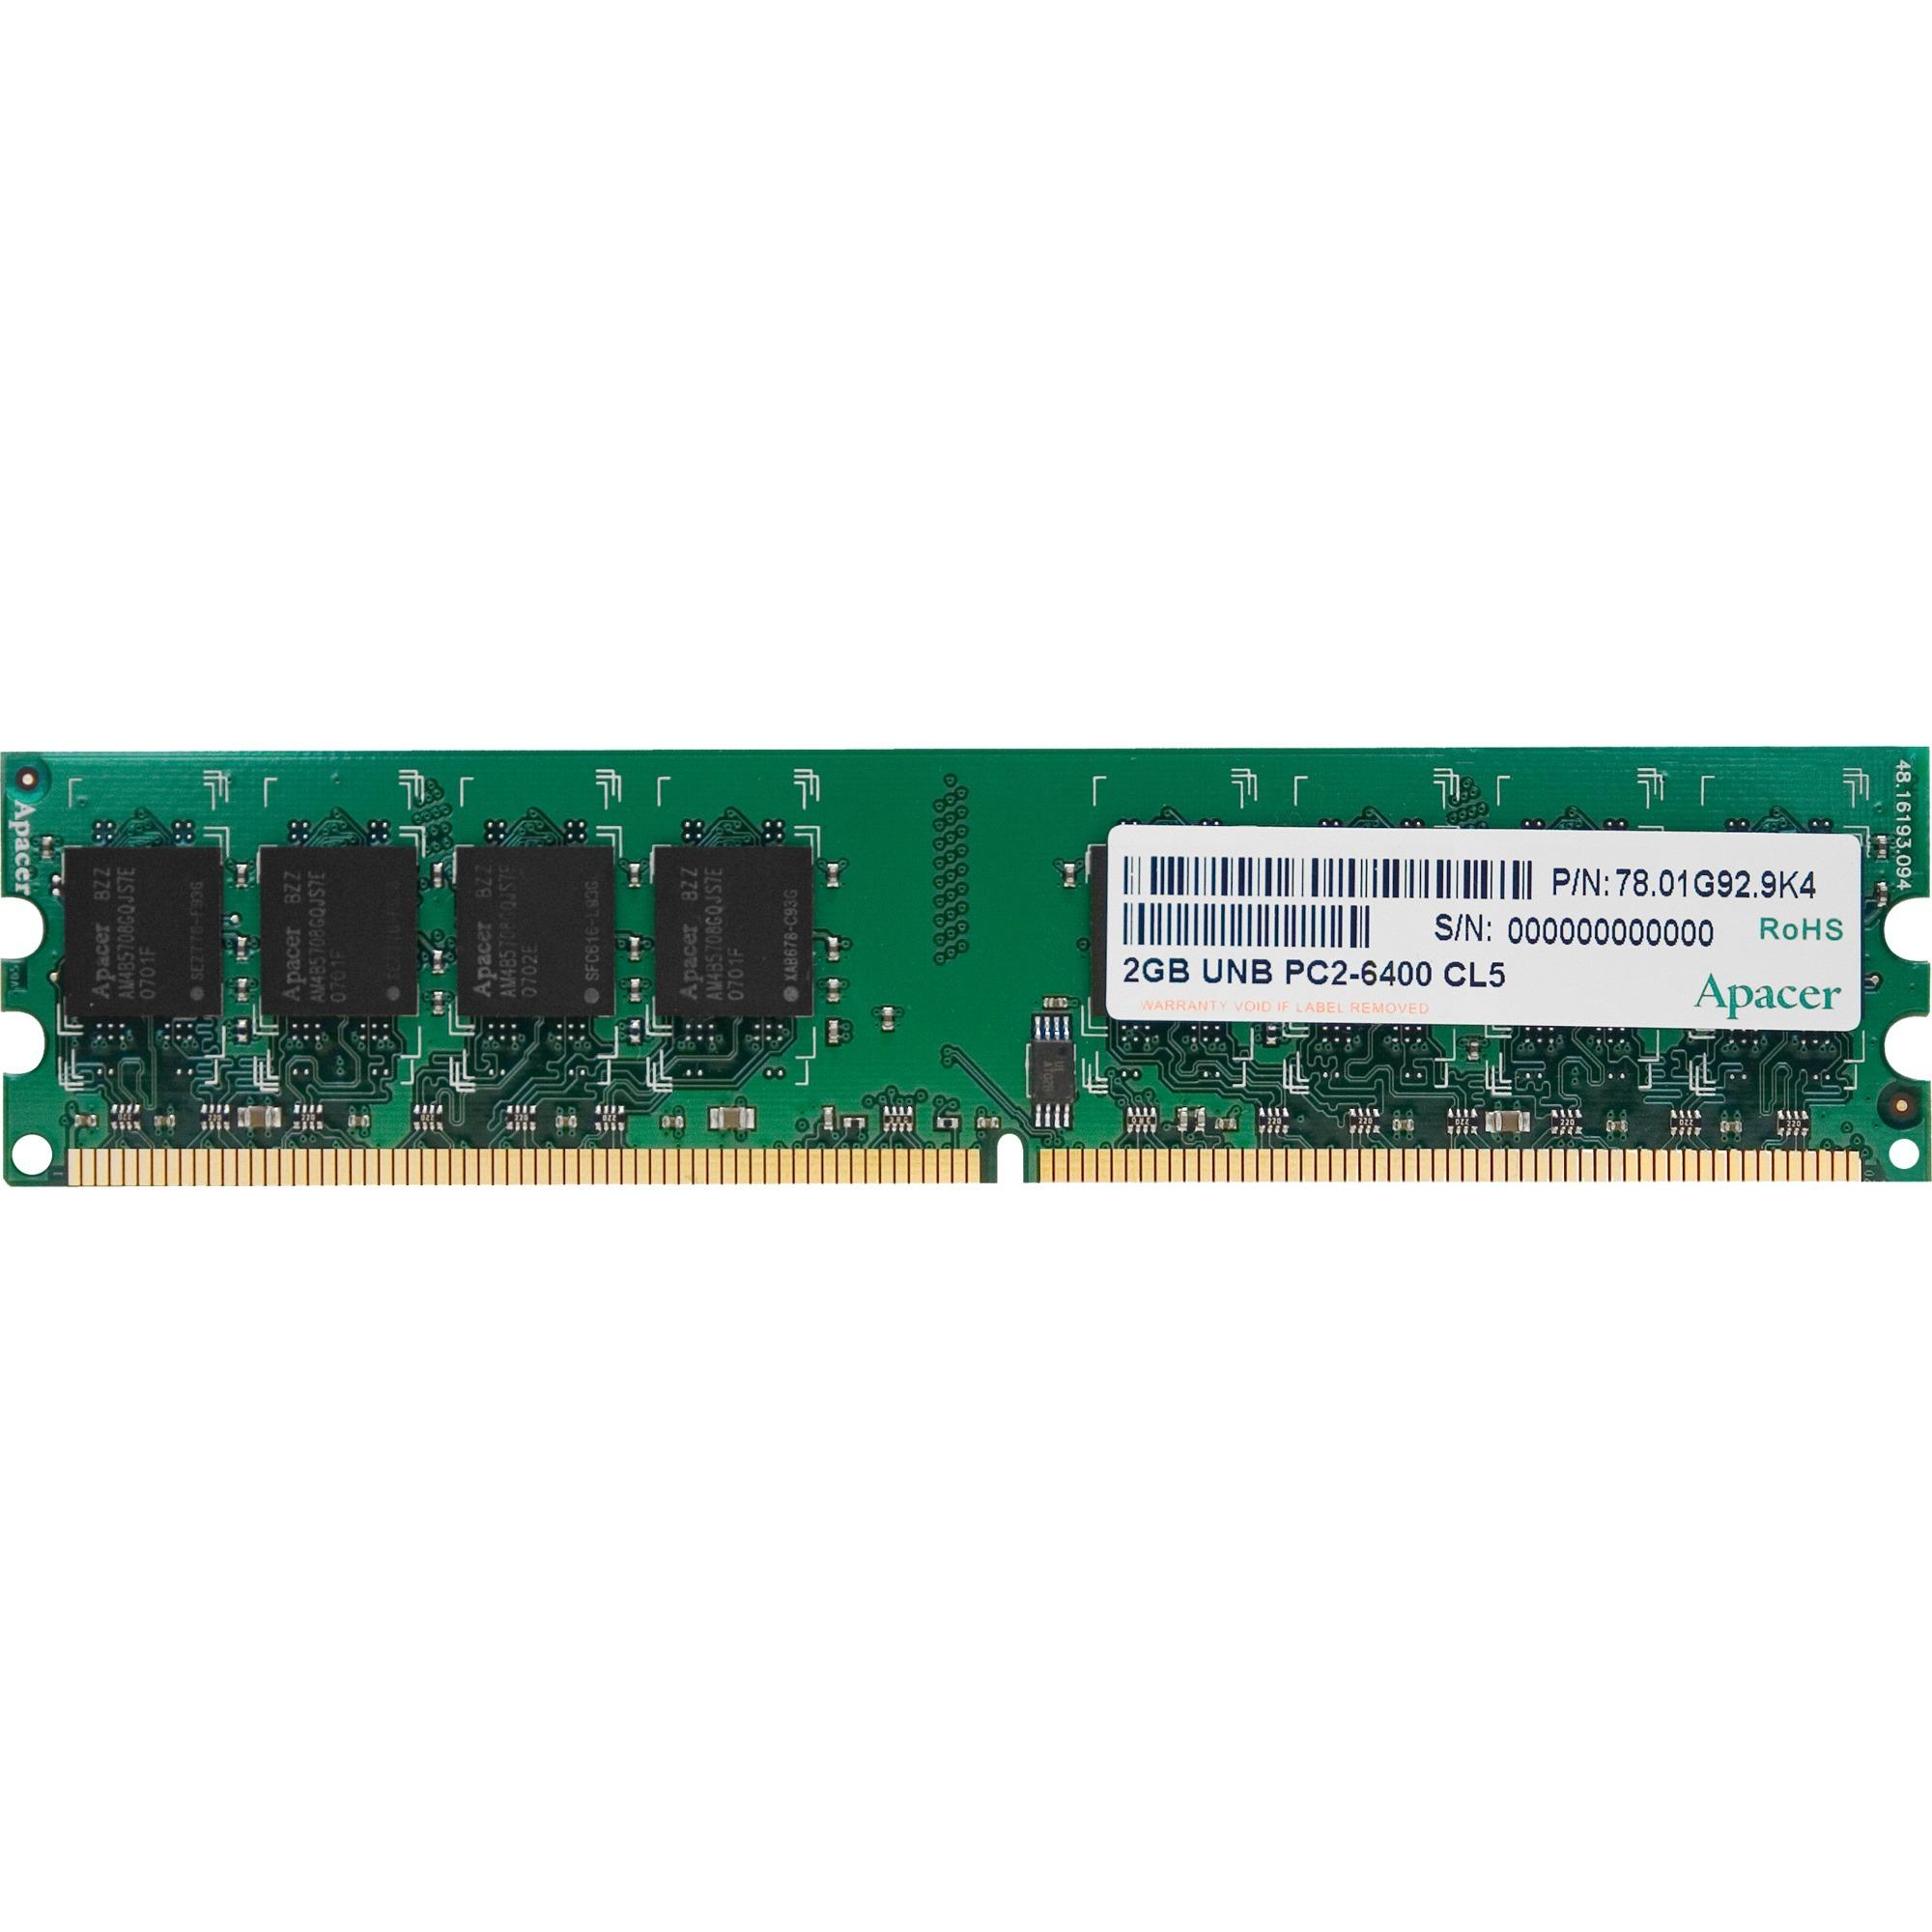 2GB DDR2 DIMM 2GB DDR2 800MHz módulo de memoria, Memoria RAM